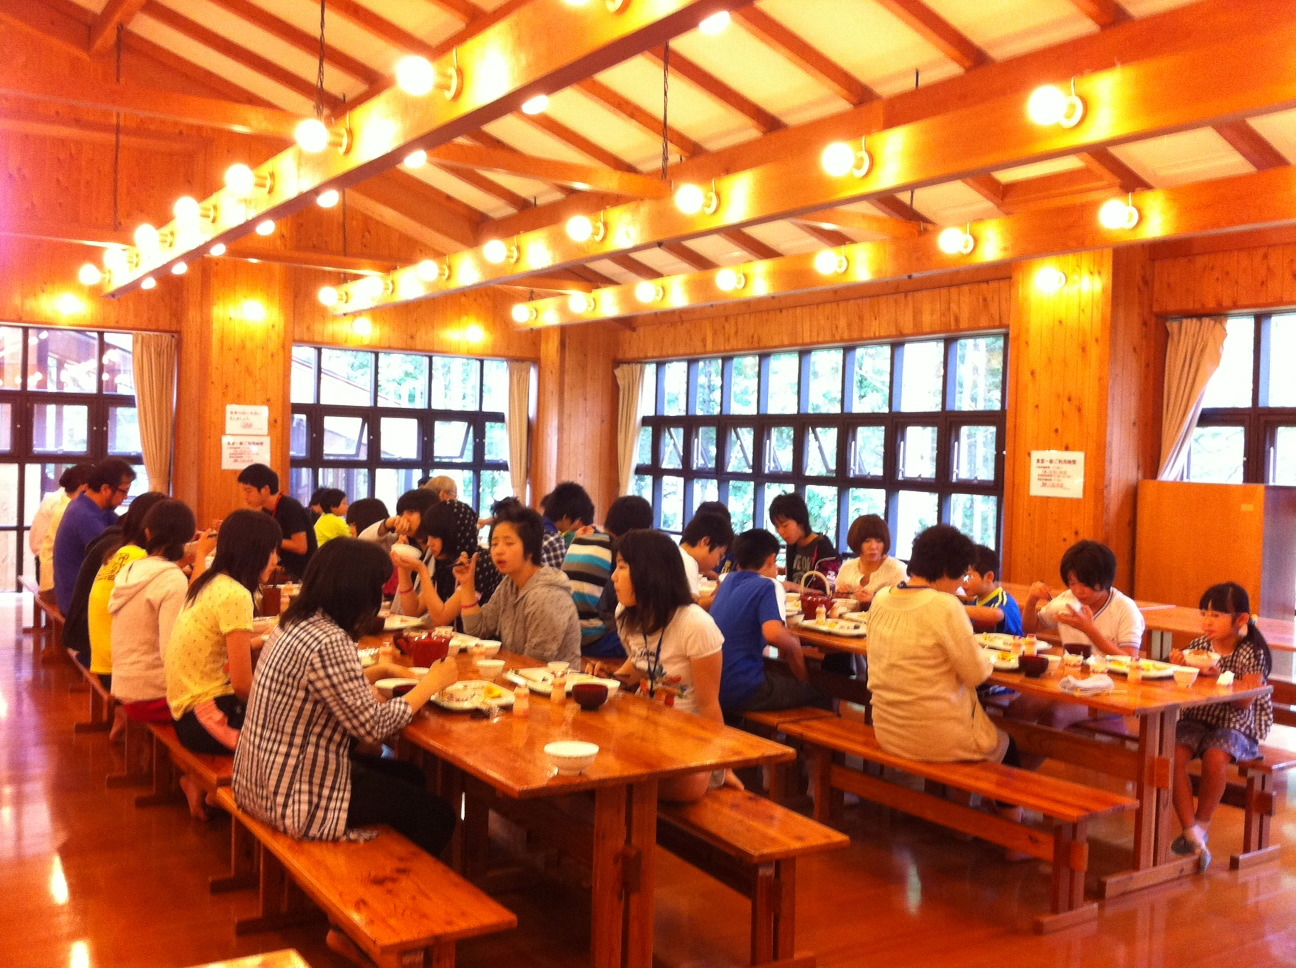 http://www.kodomonotsubasa.com/2011/07/29/0729tyosyoku02.jpg